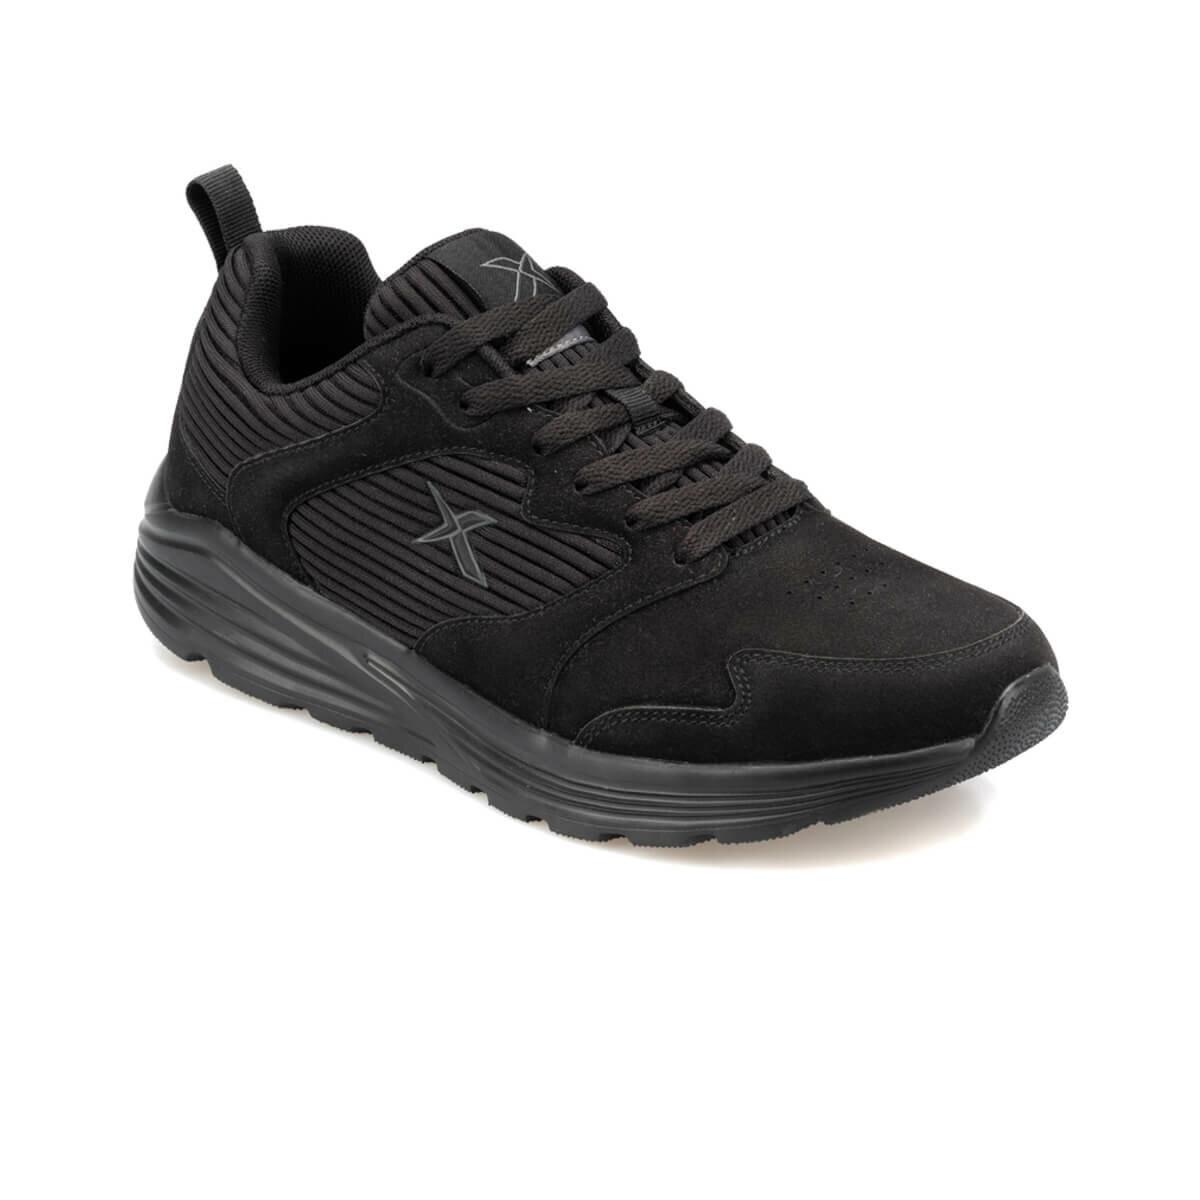 FLO SANTA M 9PR Black Men 'S Sneaker Shoes KINETIX